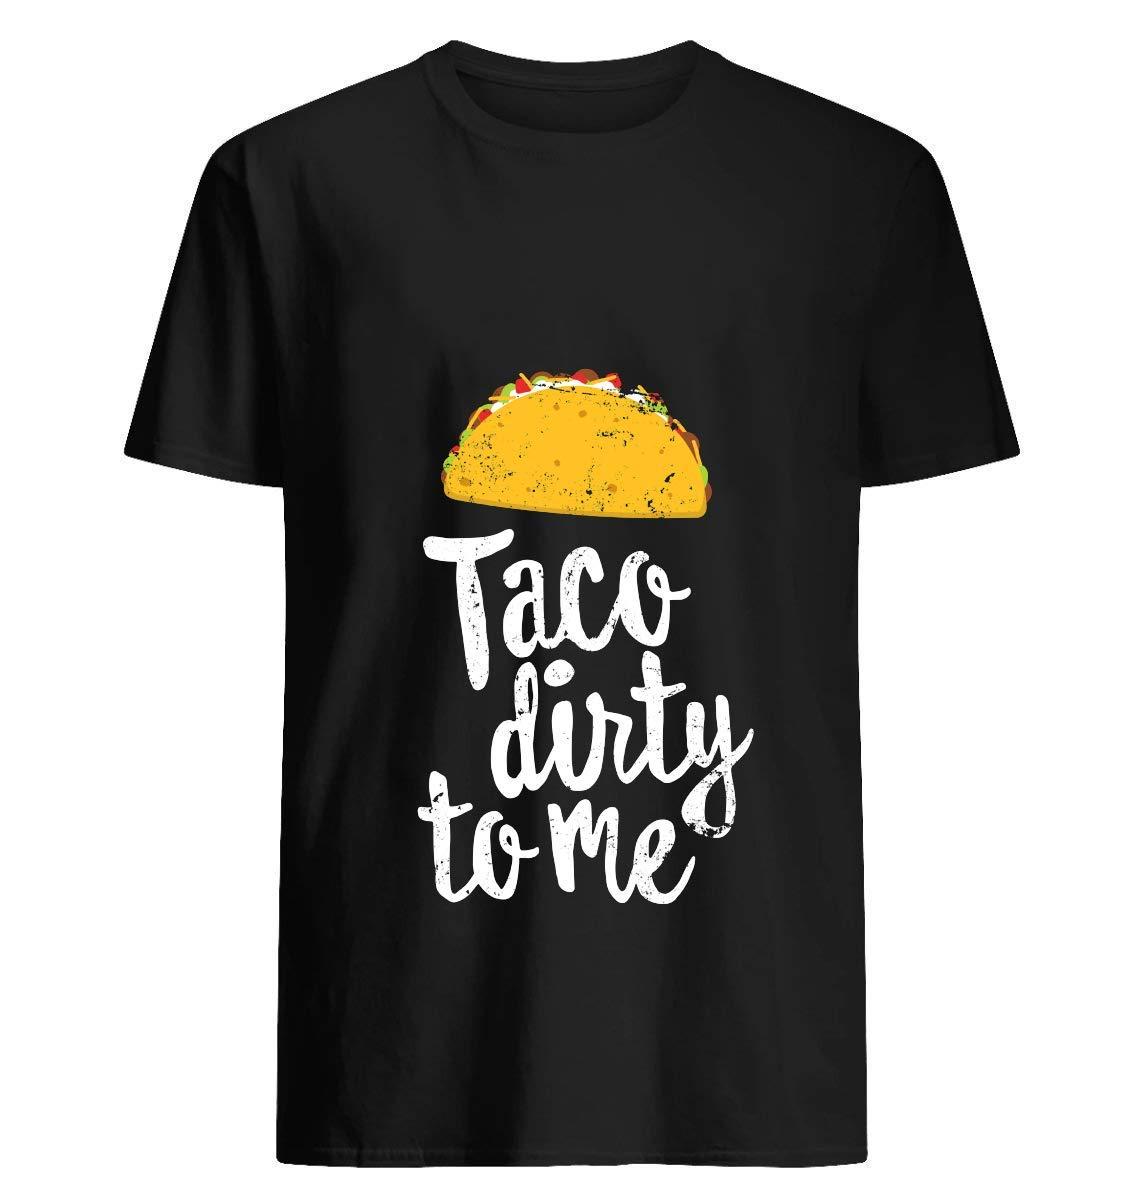 Funny Taco Shirt Taco Dirty Adult Cinco De Mayo Distressed 83